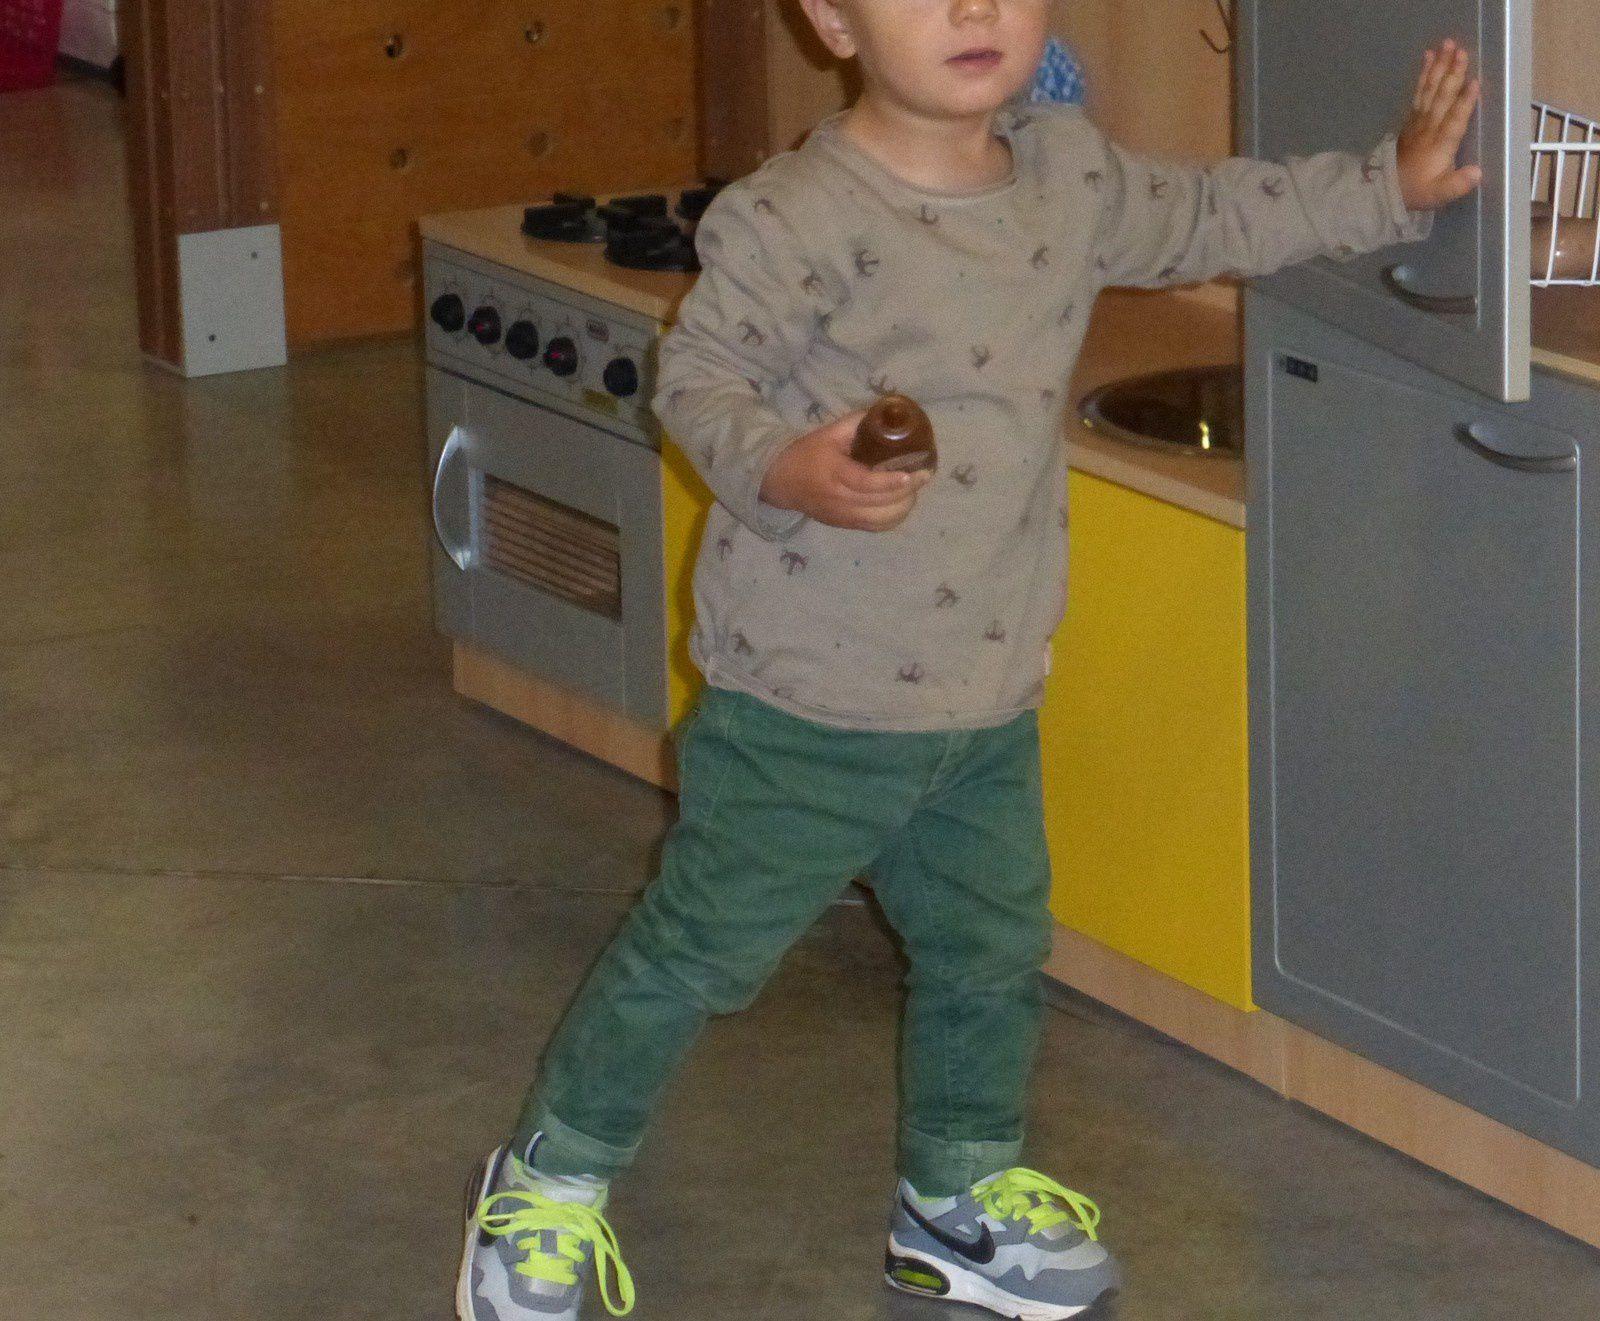 Simon porte un tee-shirt Zara Baby, un jean Tape à l'oeil et des baskets Nike Air Max.